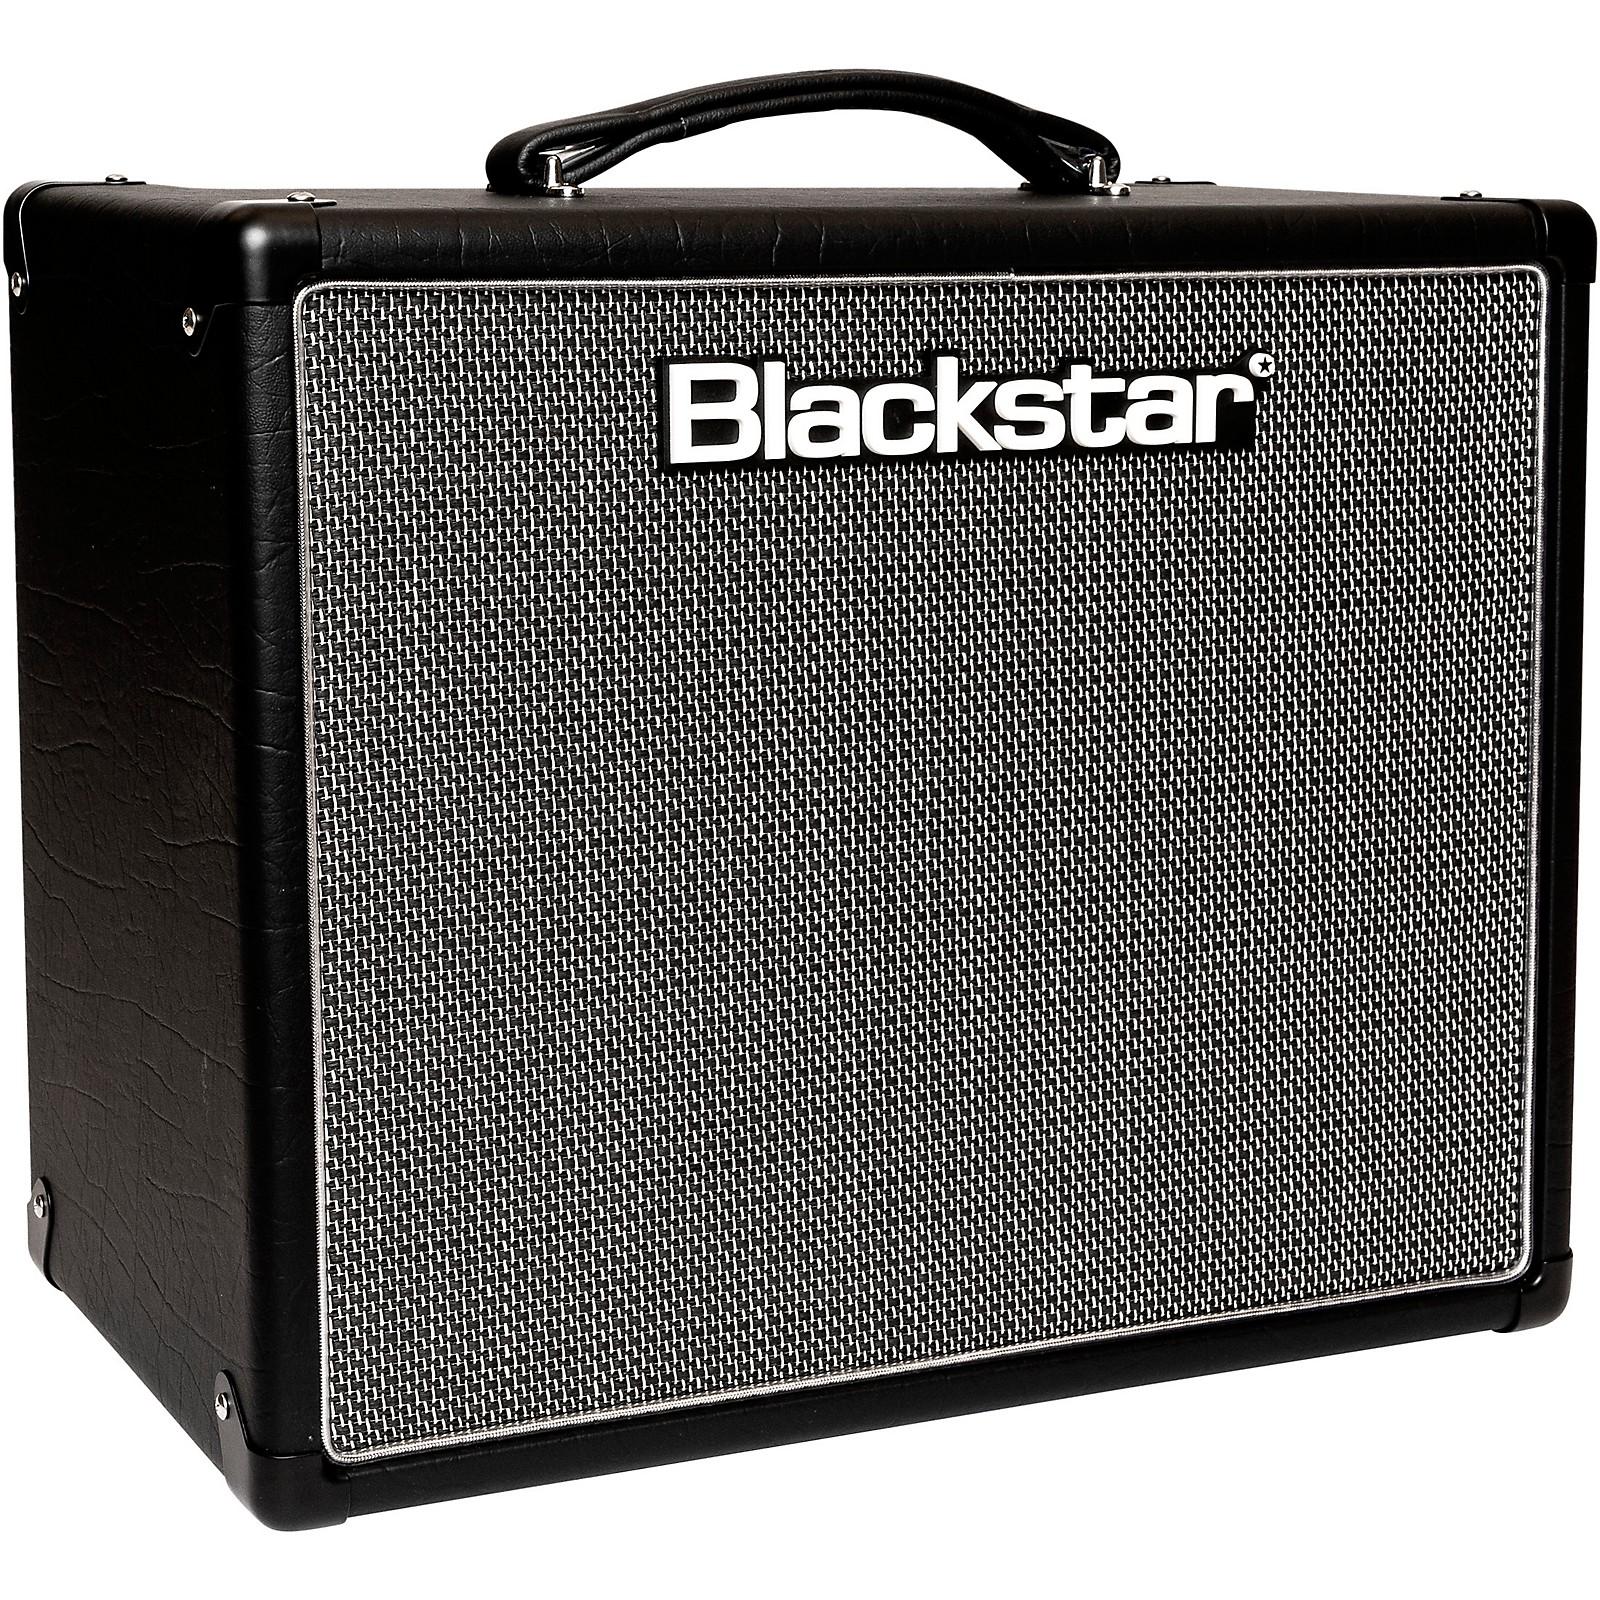 Open Box Blackstar HT-5RH MkII 5W 1x12 Tube Guitar Combo Amp